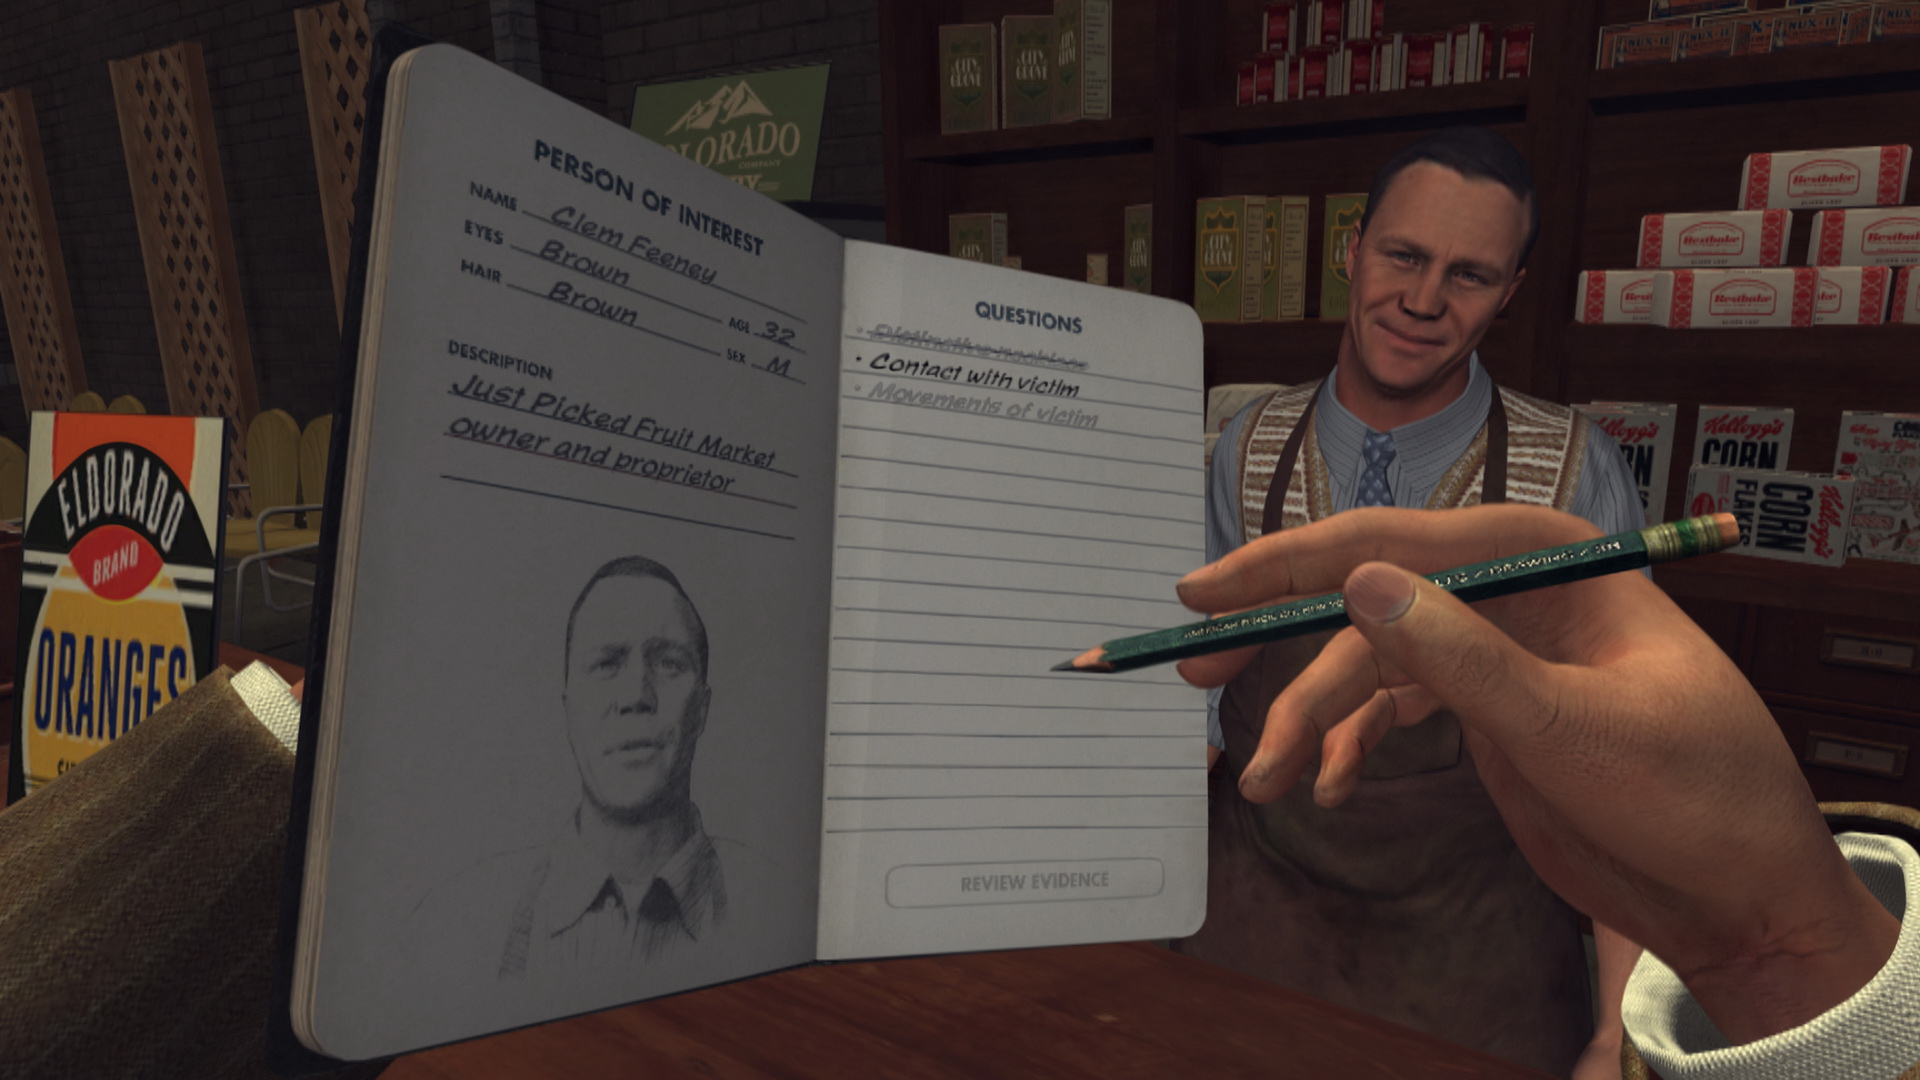 Rockstar GTA V VR L.A Noire Video Games Deluxe